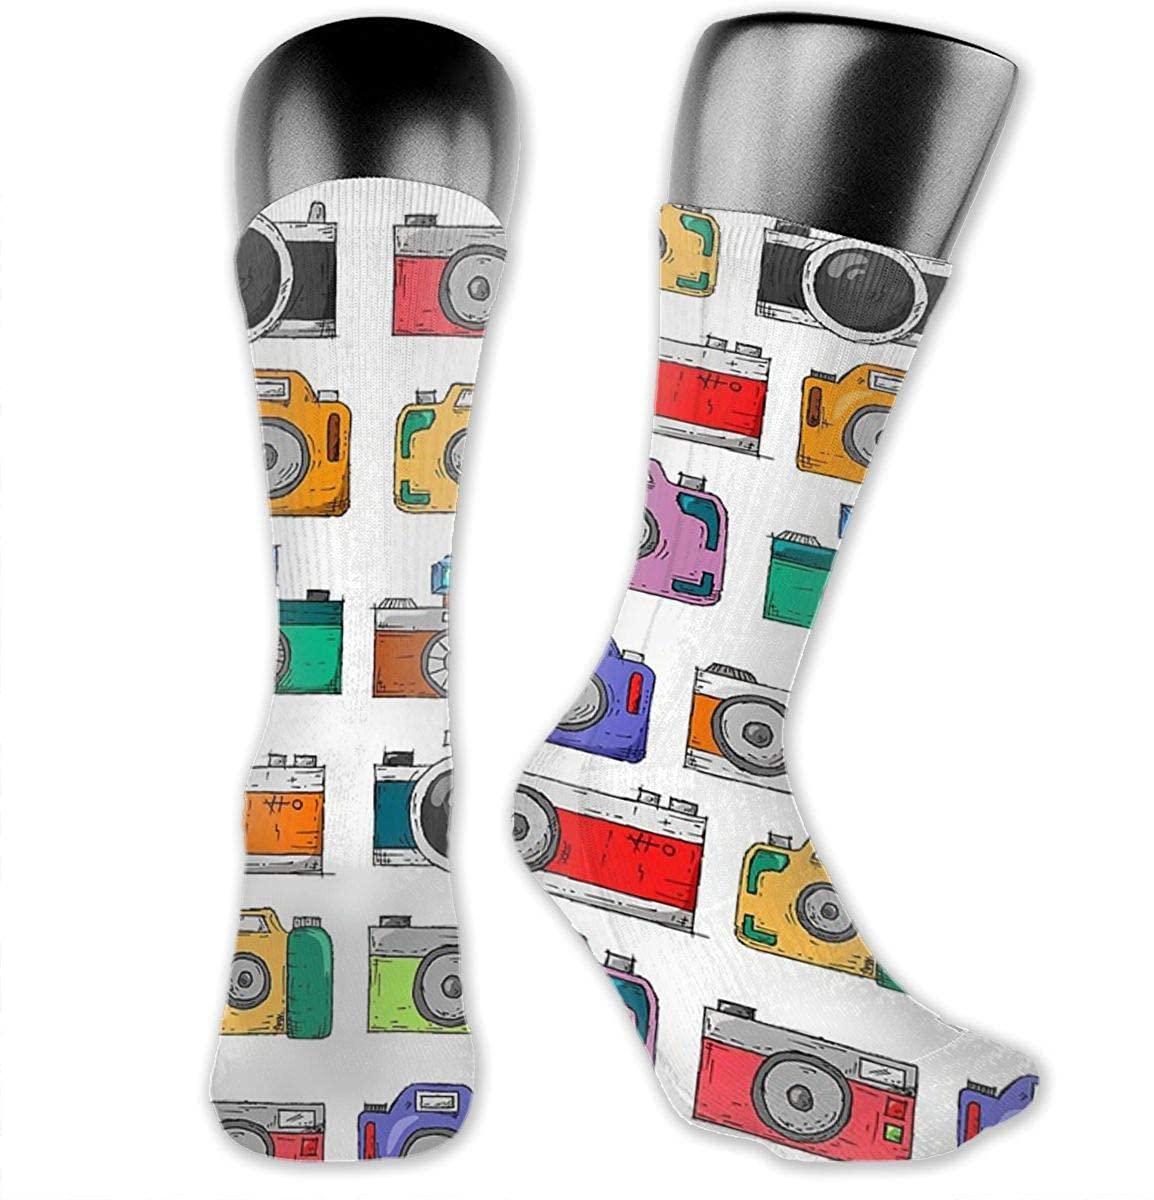 Unisex Crazy Funny Retro Camera Socks Colorful Athletic Medica Socks Novelty Casual Crew Socks